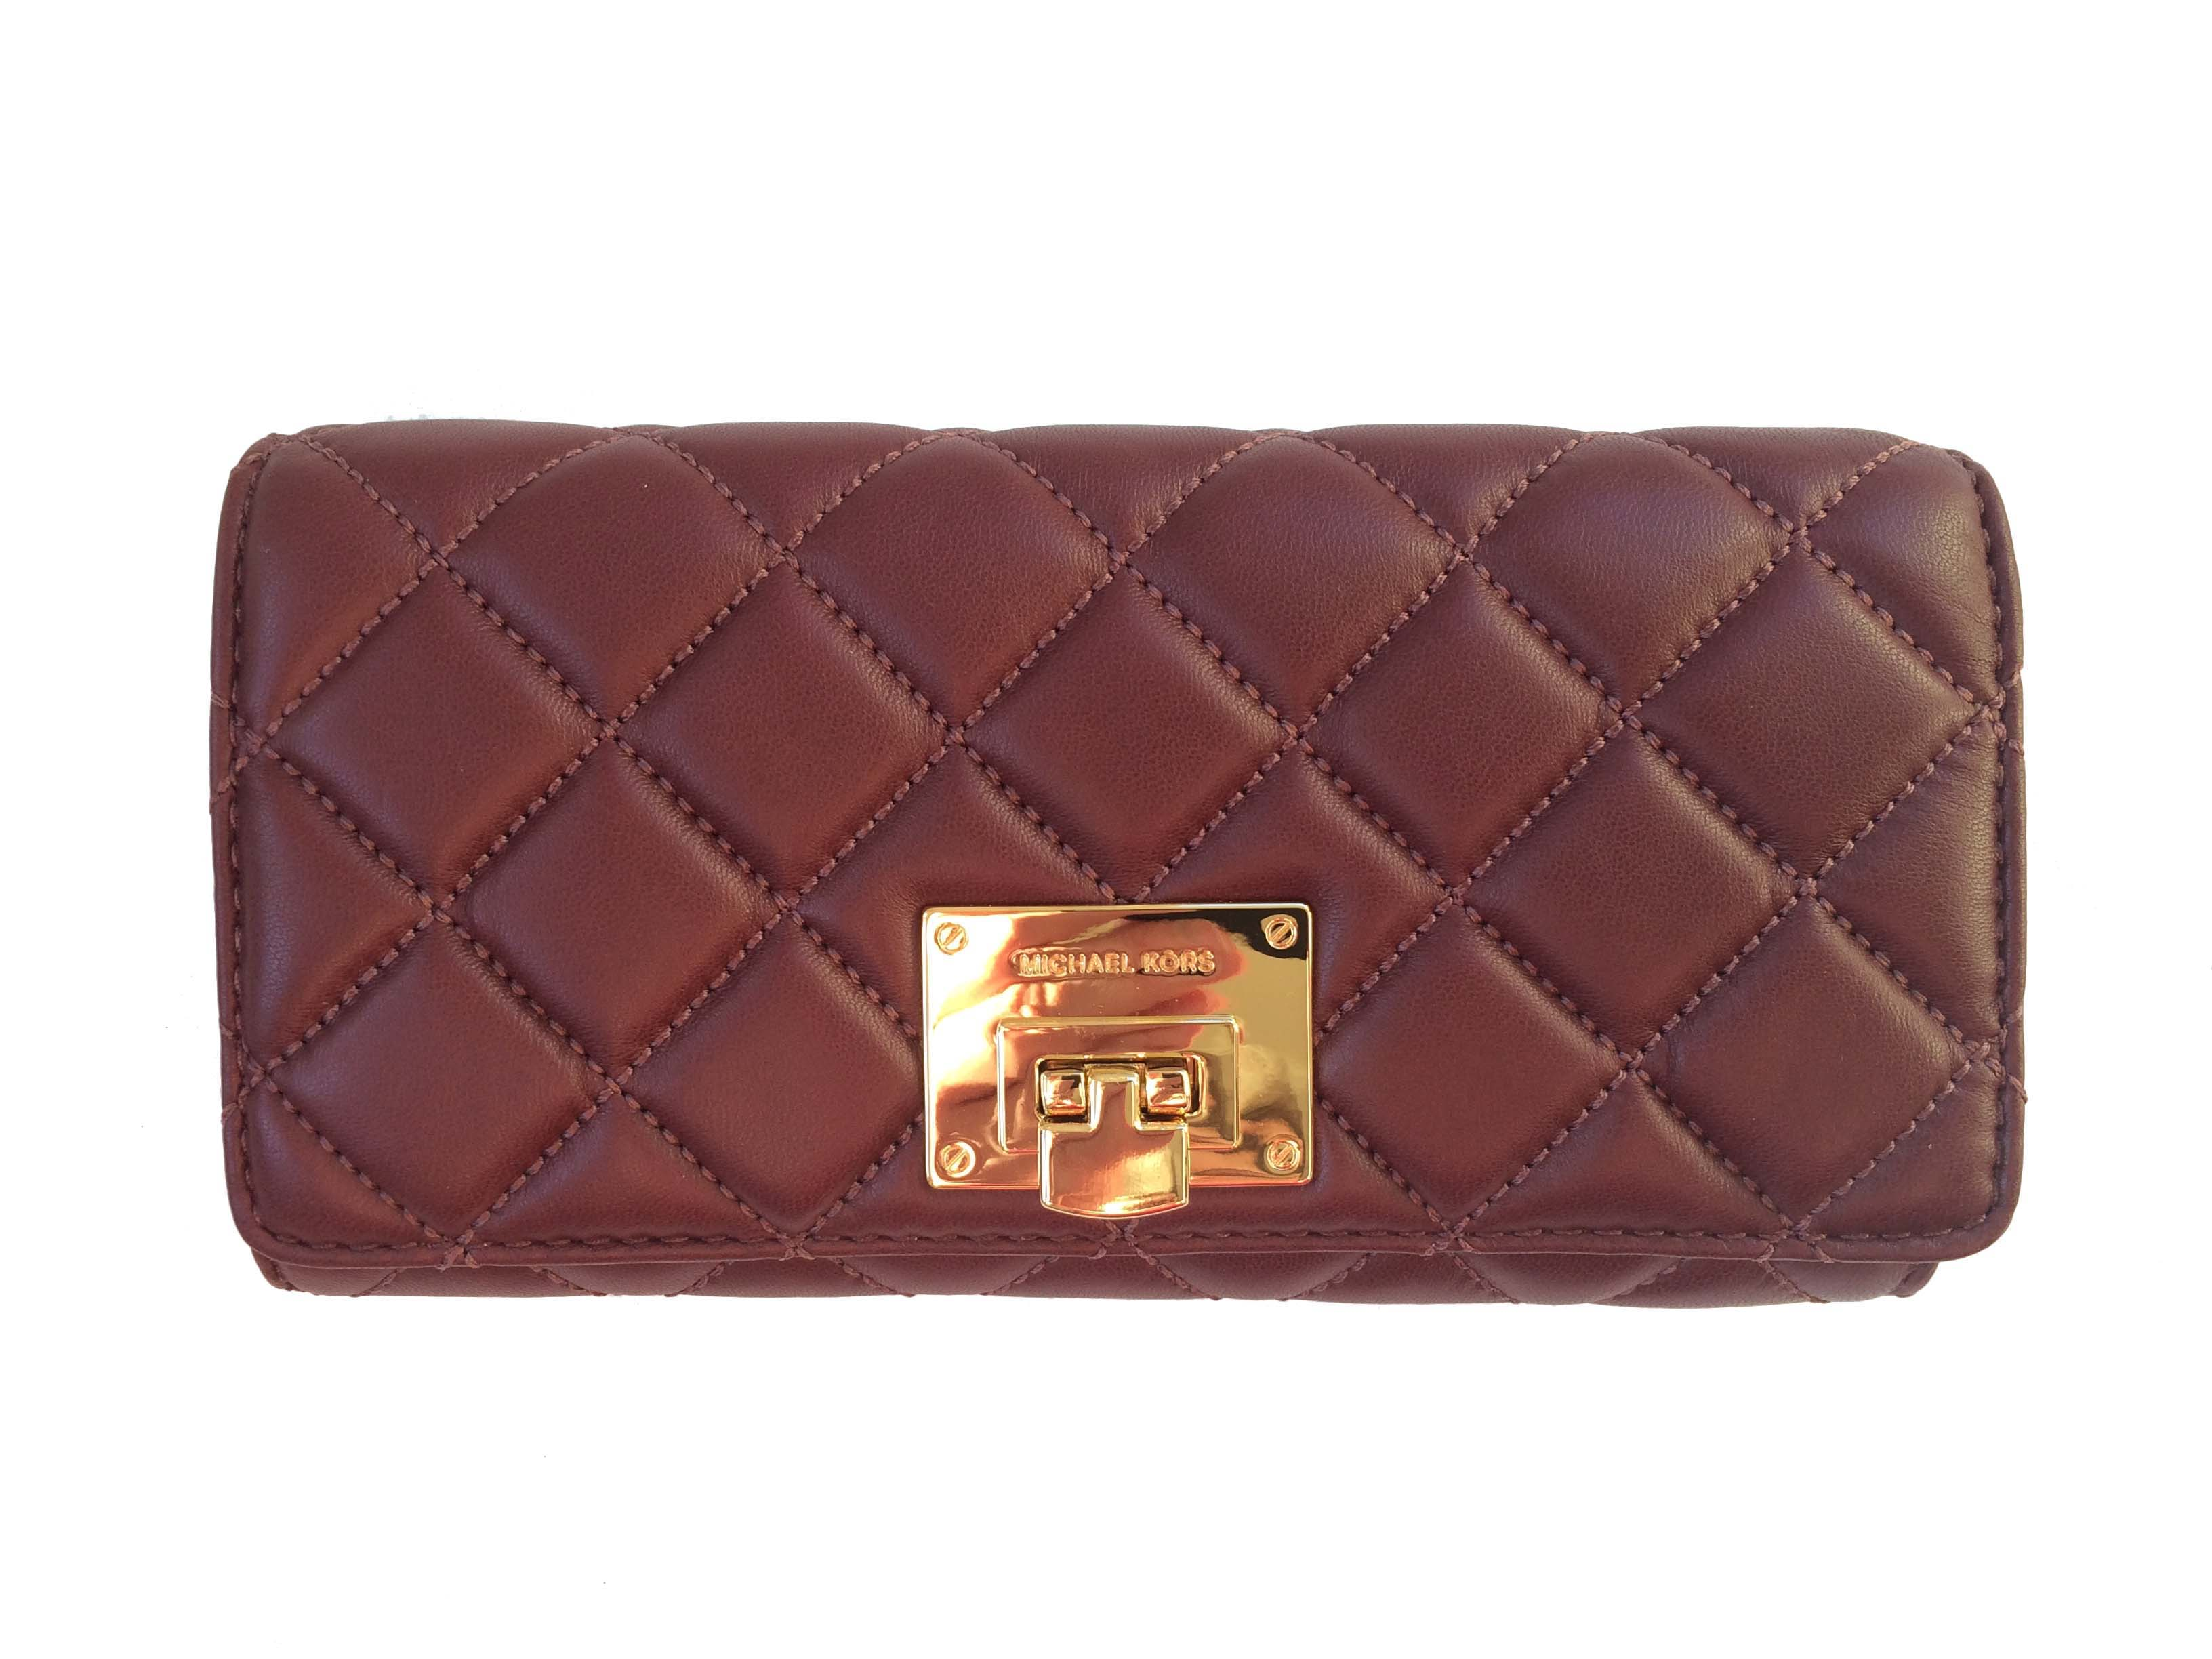 0194481d7c1934 Michael Kors - Michael Kors Astrid Leather Carryall Wallet (Merlot) -  Walmart.com